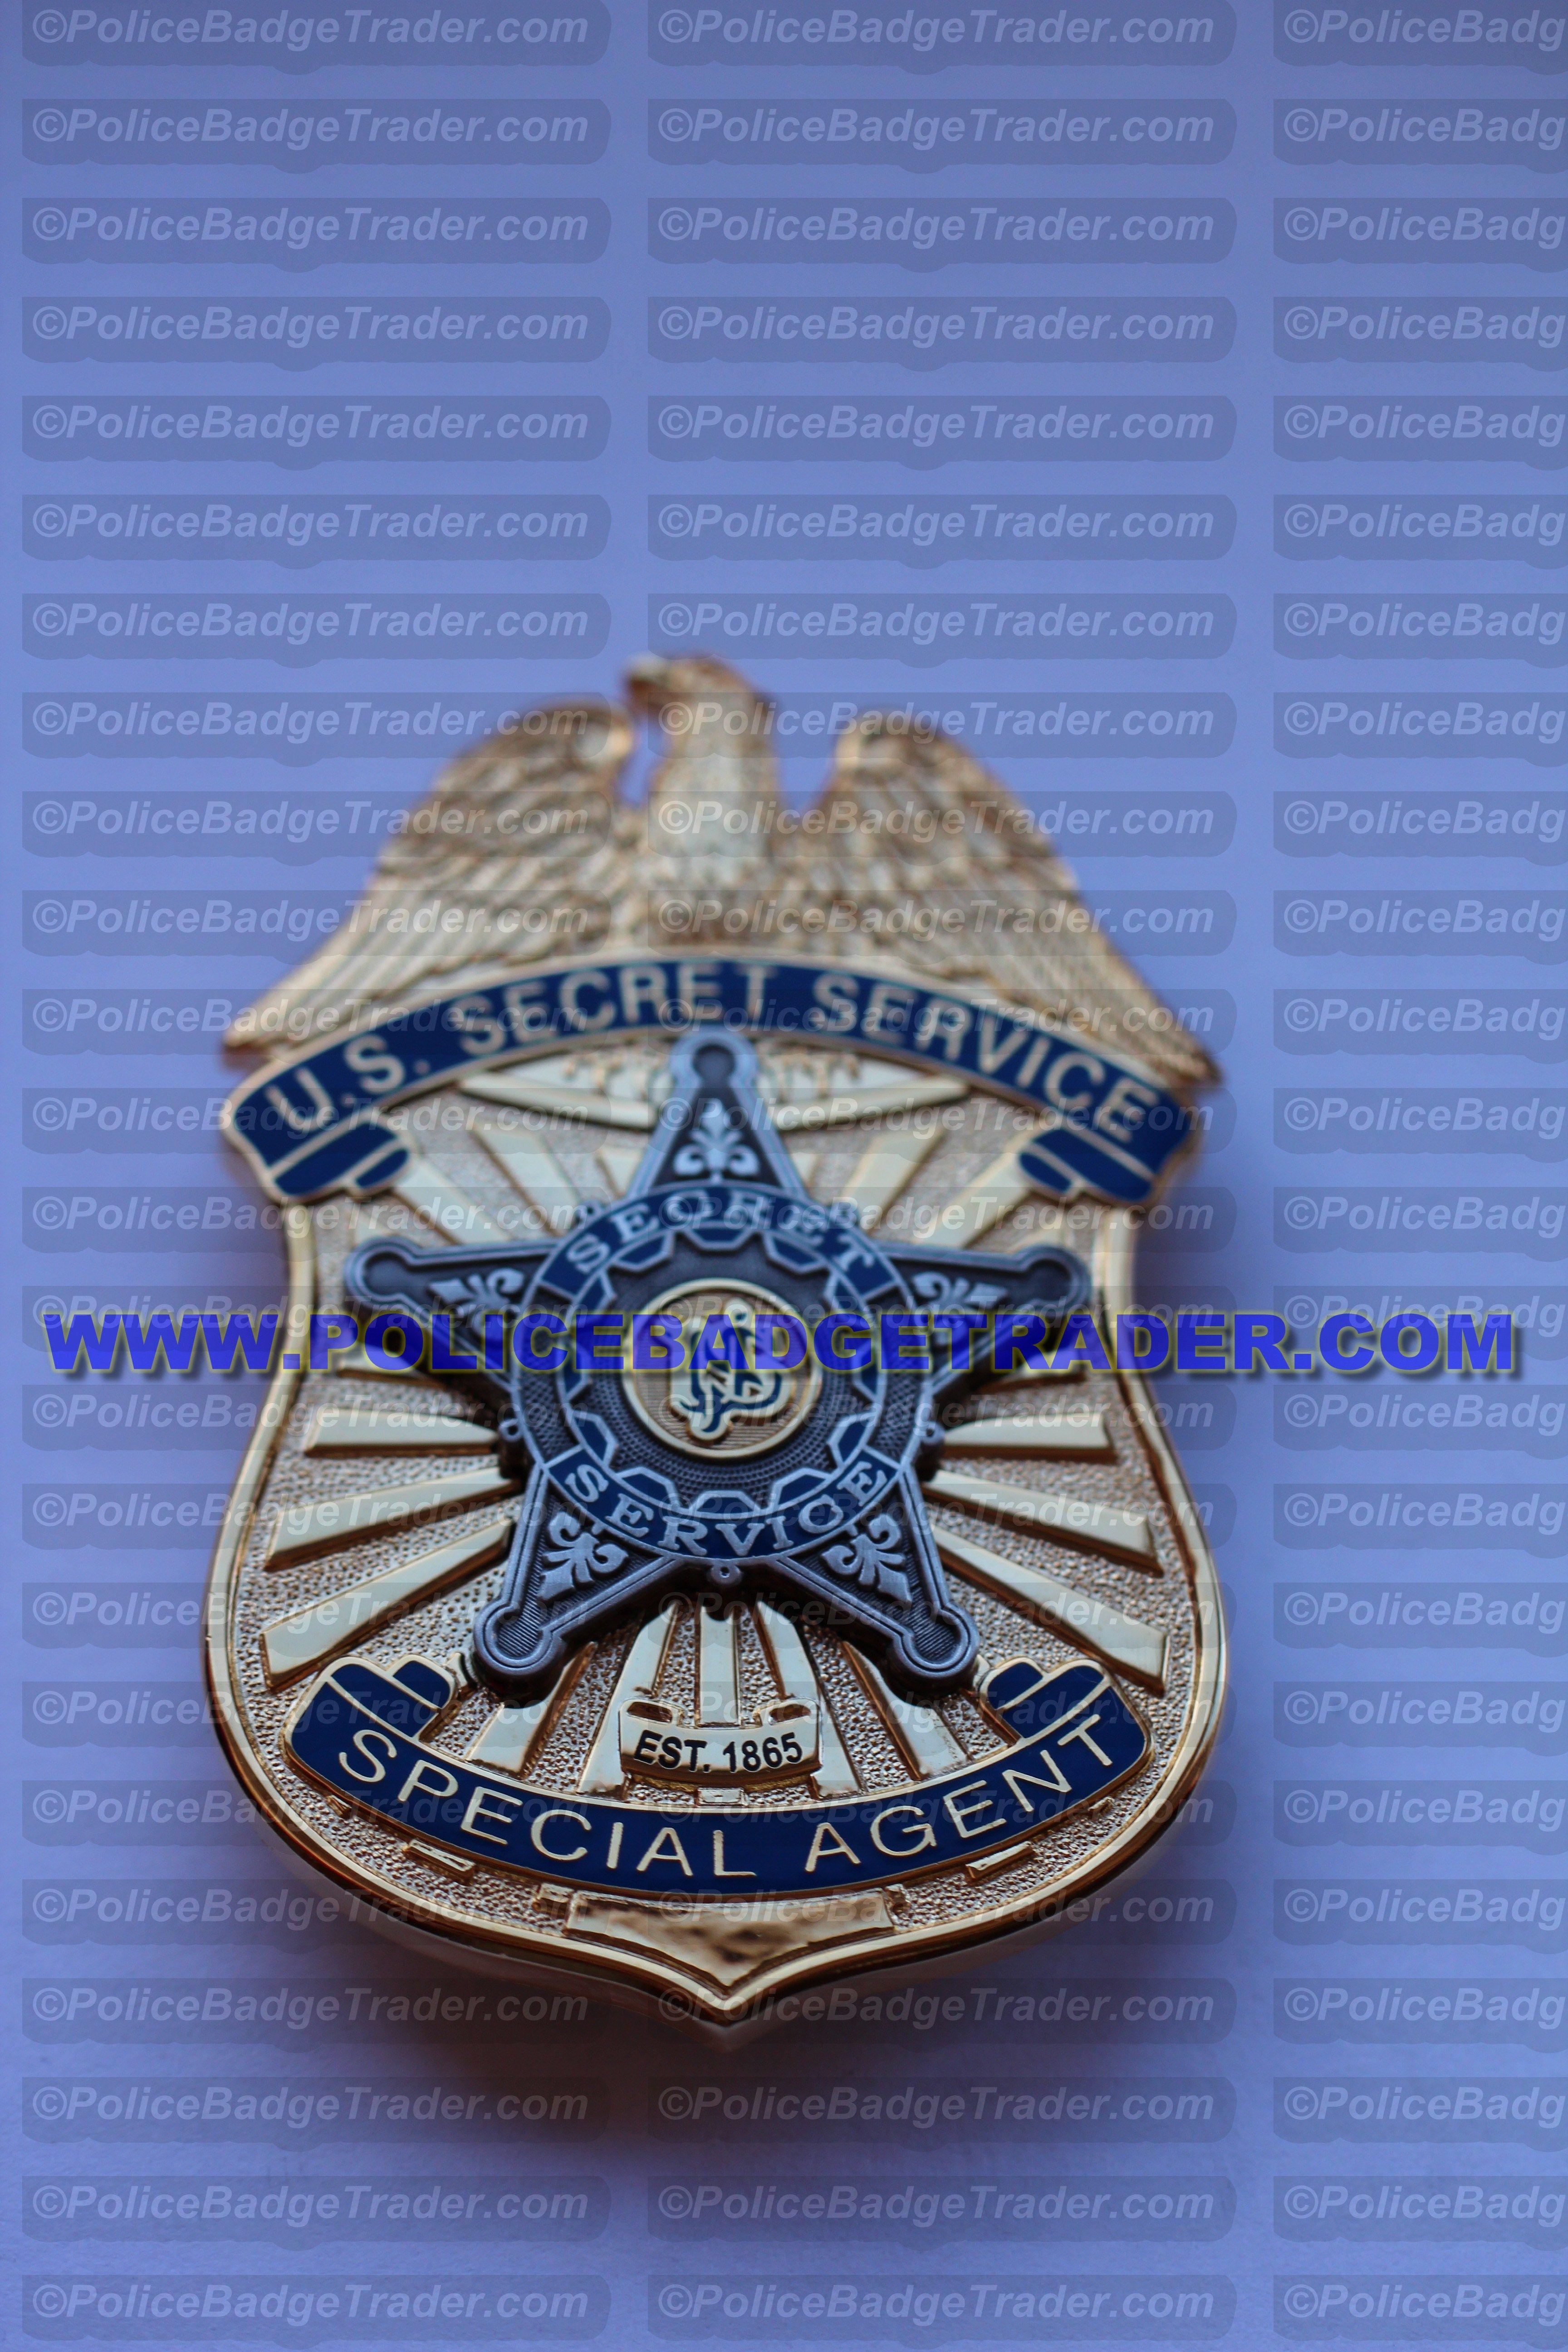 US Secret Service Special Agent badge. Sun Badge Hallmark